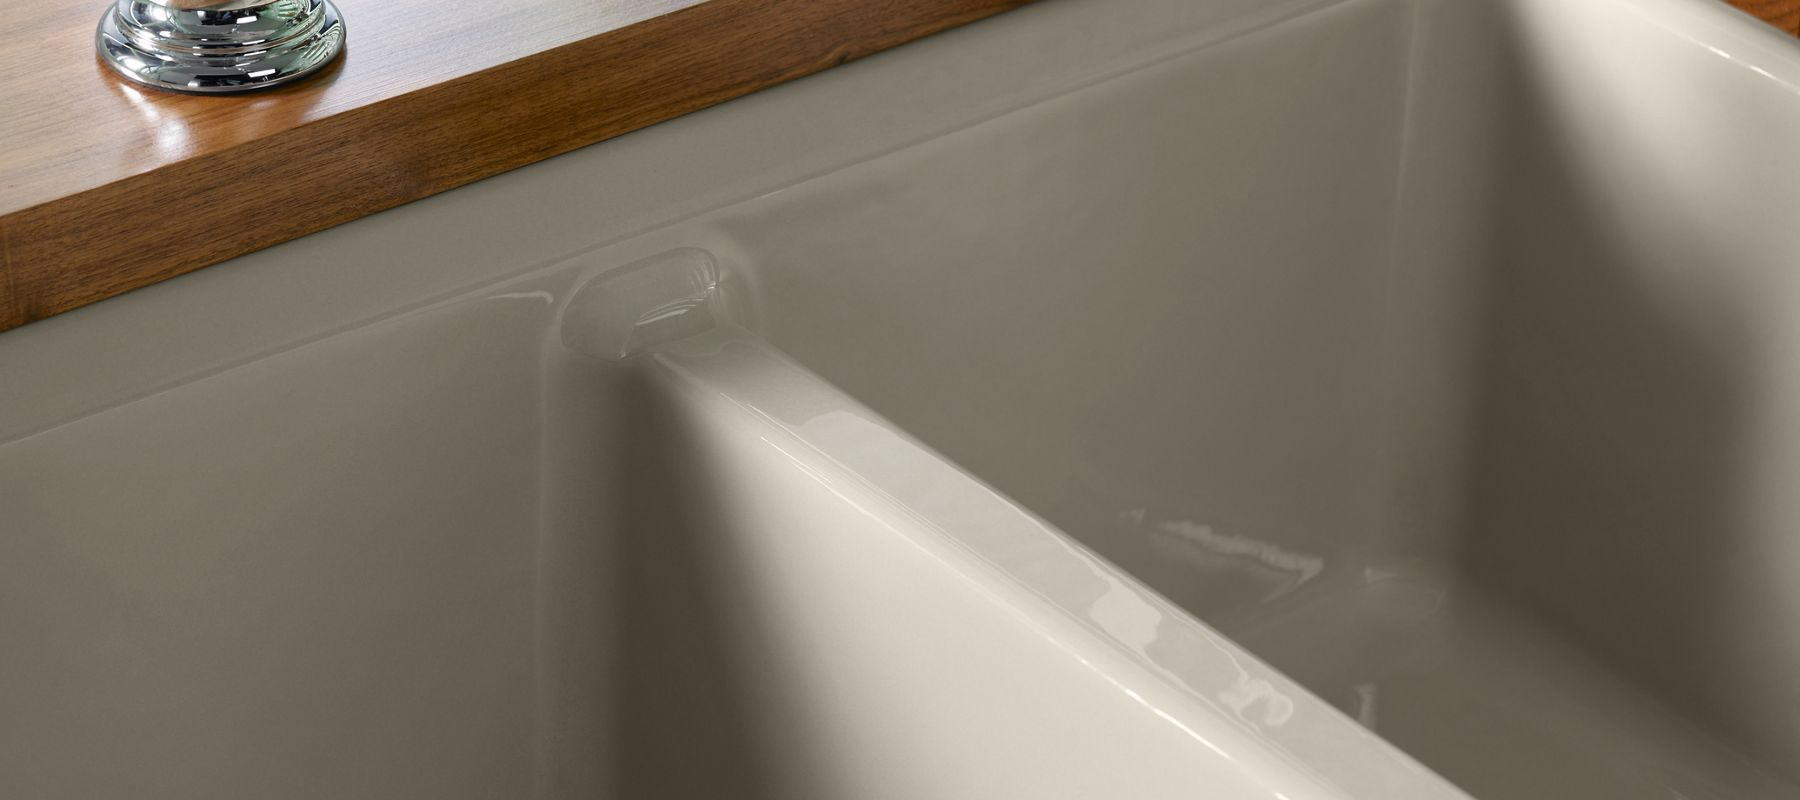 White Enamel Kitchen Sinks Enameled Cast Iron Kitchen Sinks Kitchen Kohler